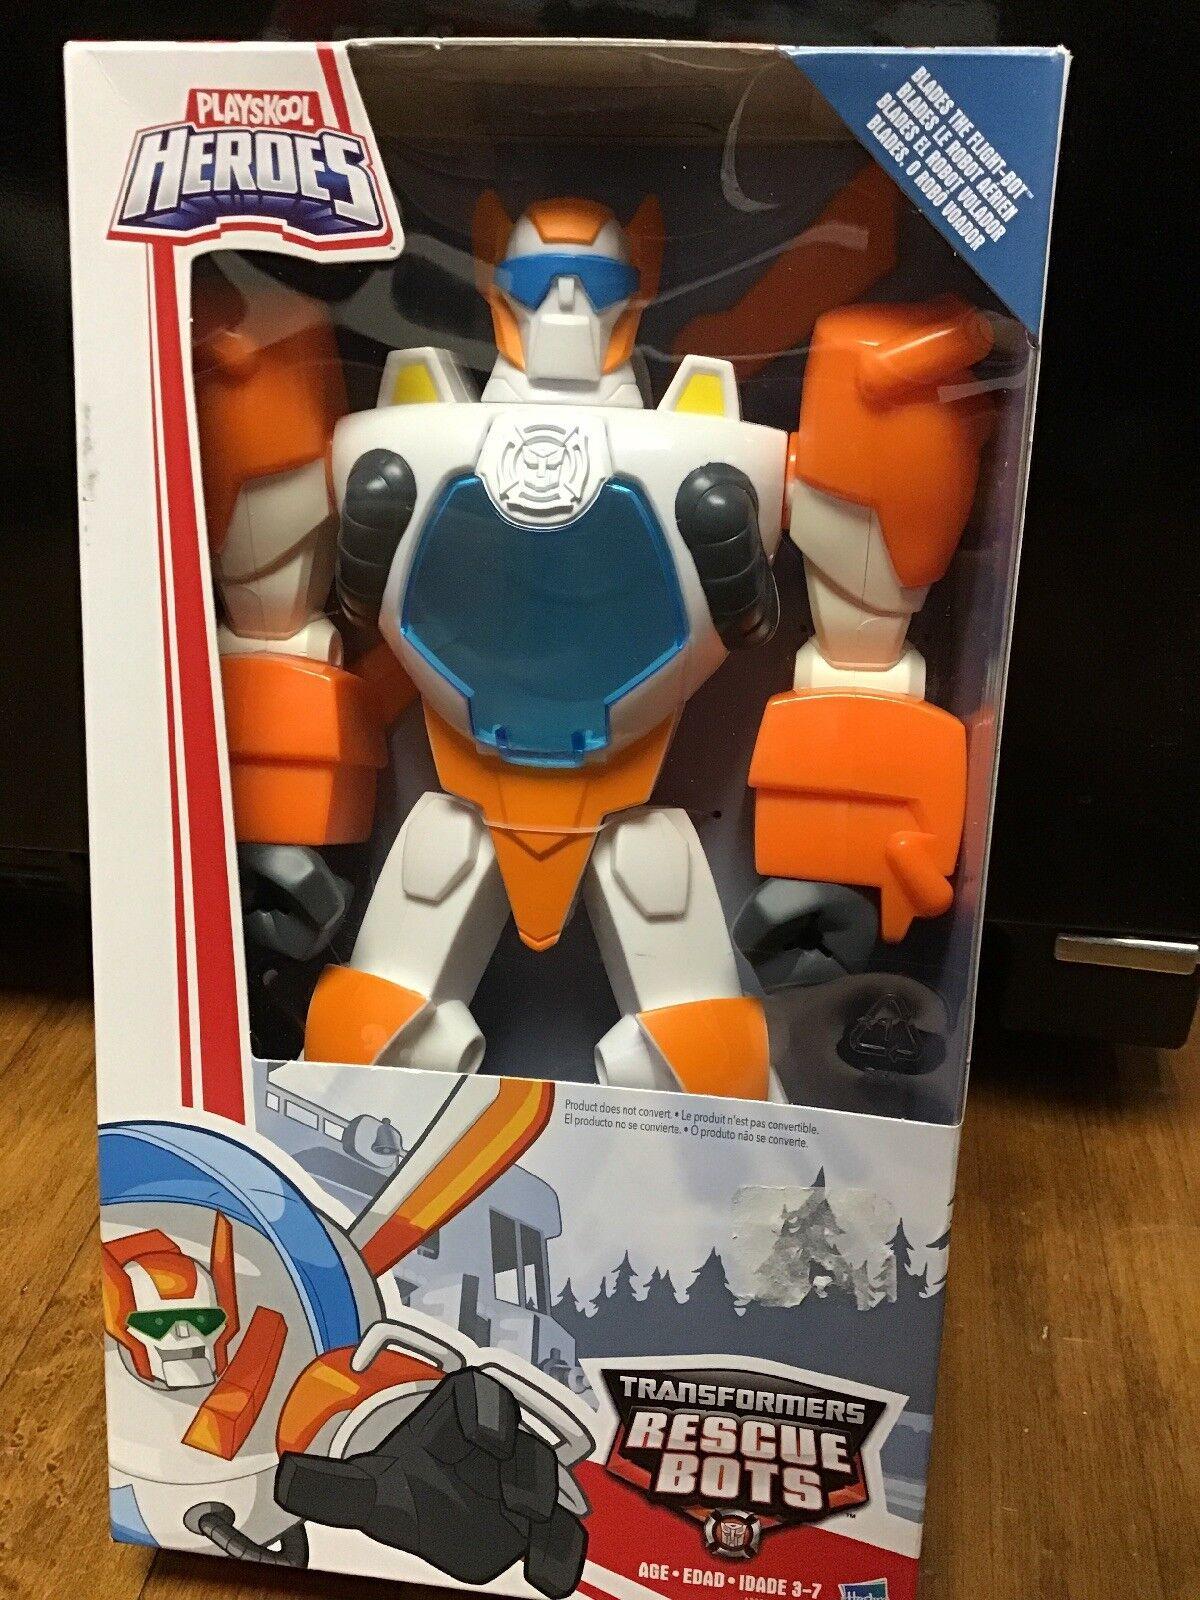 Playskool Heroes Transformateurs Rescue Bots Blades le vol-Bot action figure